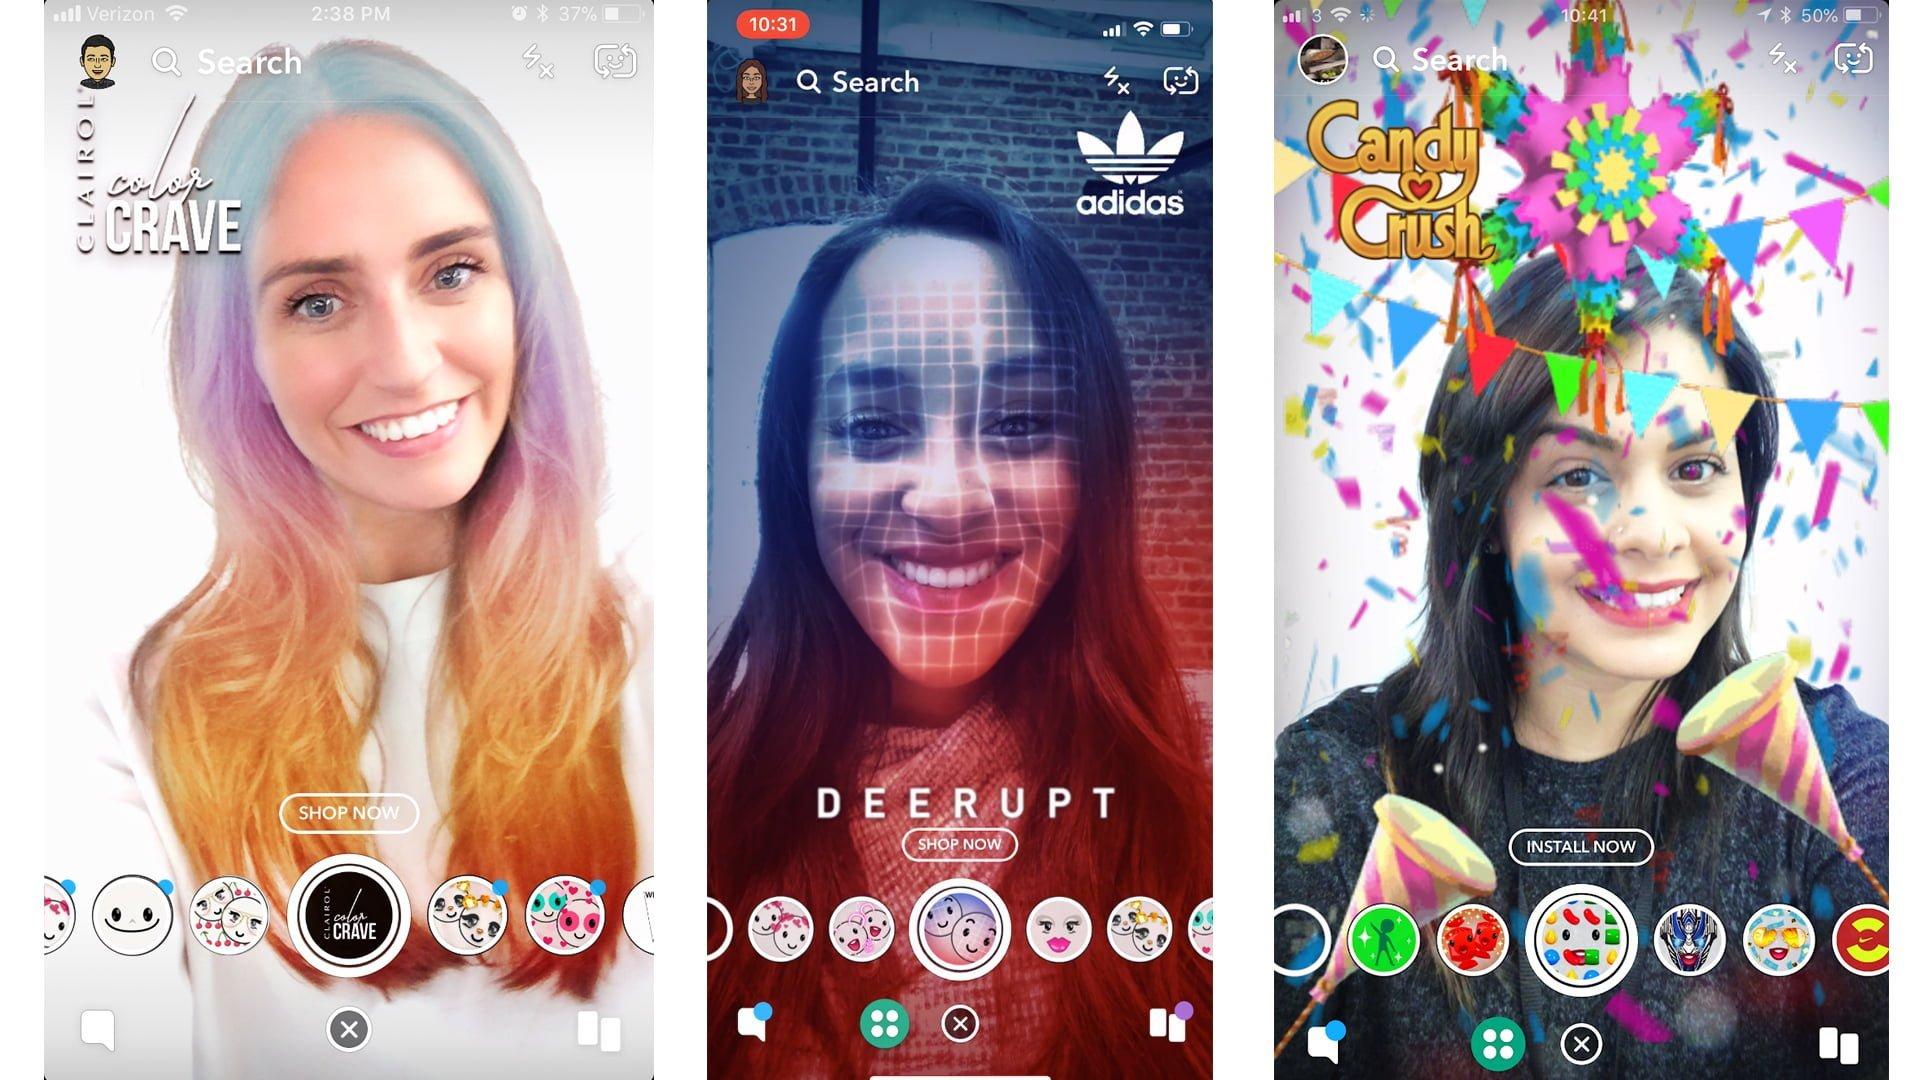 Adidas And Candy Crush Sponsored Lenses  - Adidas and Candy Crush Sponsored Lenses - MAKE MONEY on SNAPCHAT – 4 Methods